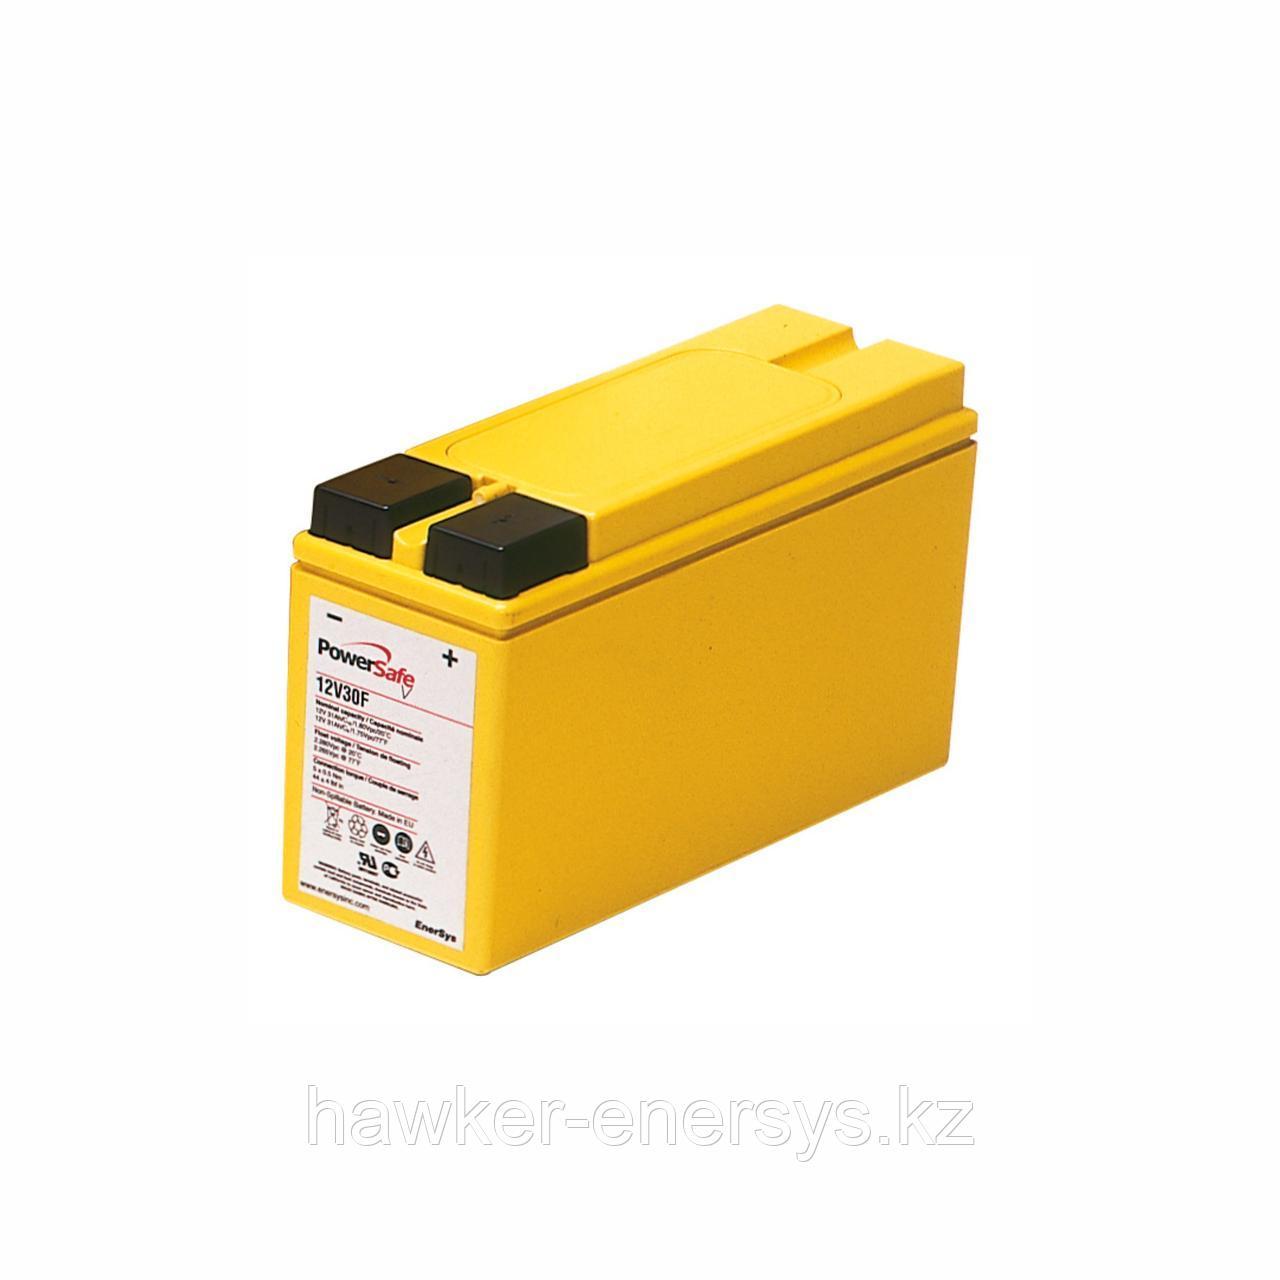 Аккумуляторная батарея PowerSafe 12V30F